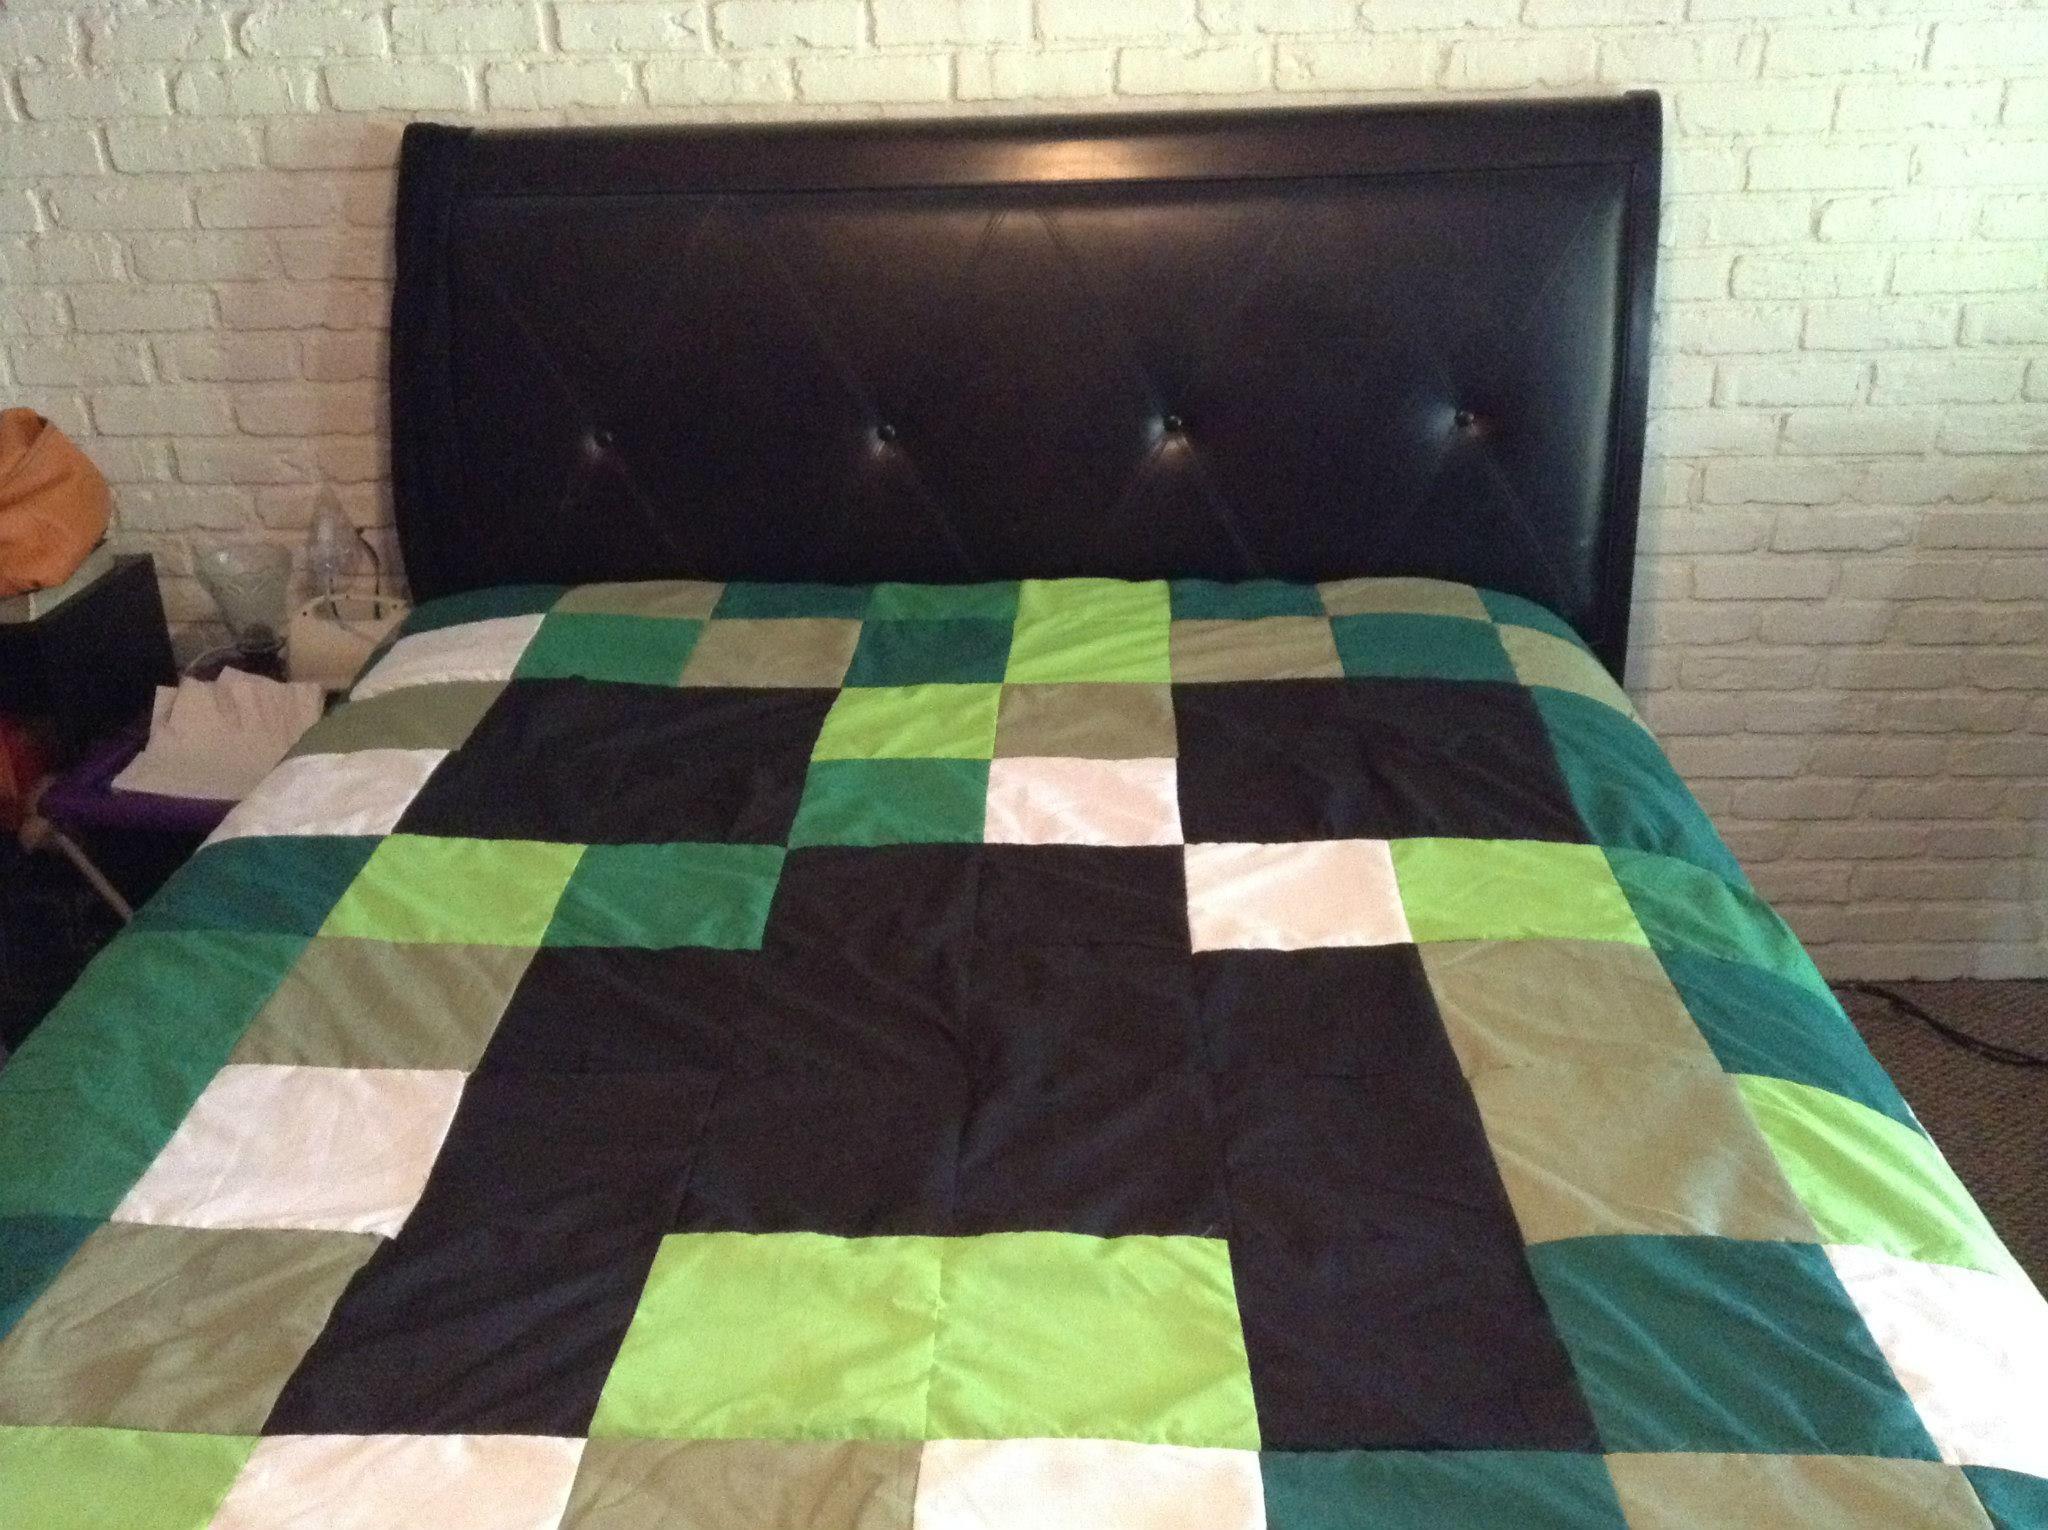 Minecraft Creeper Handmade quilt ** ON SALE NOW! www.etsy.com/shop/bluesleepyowl